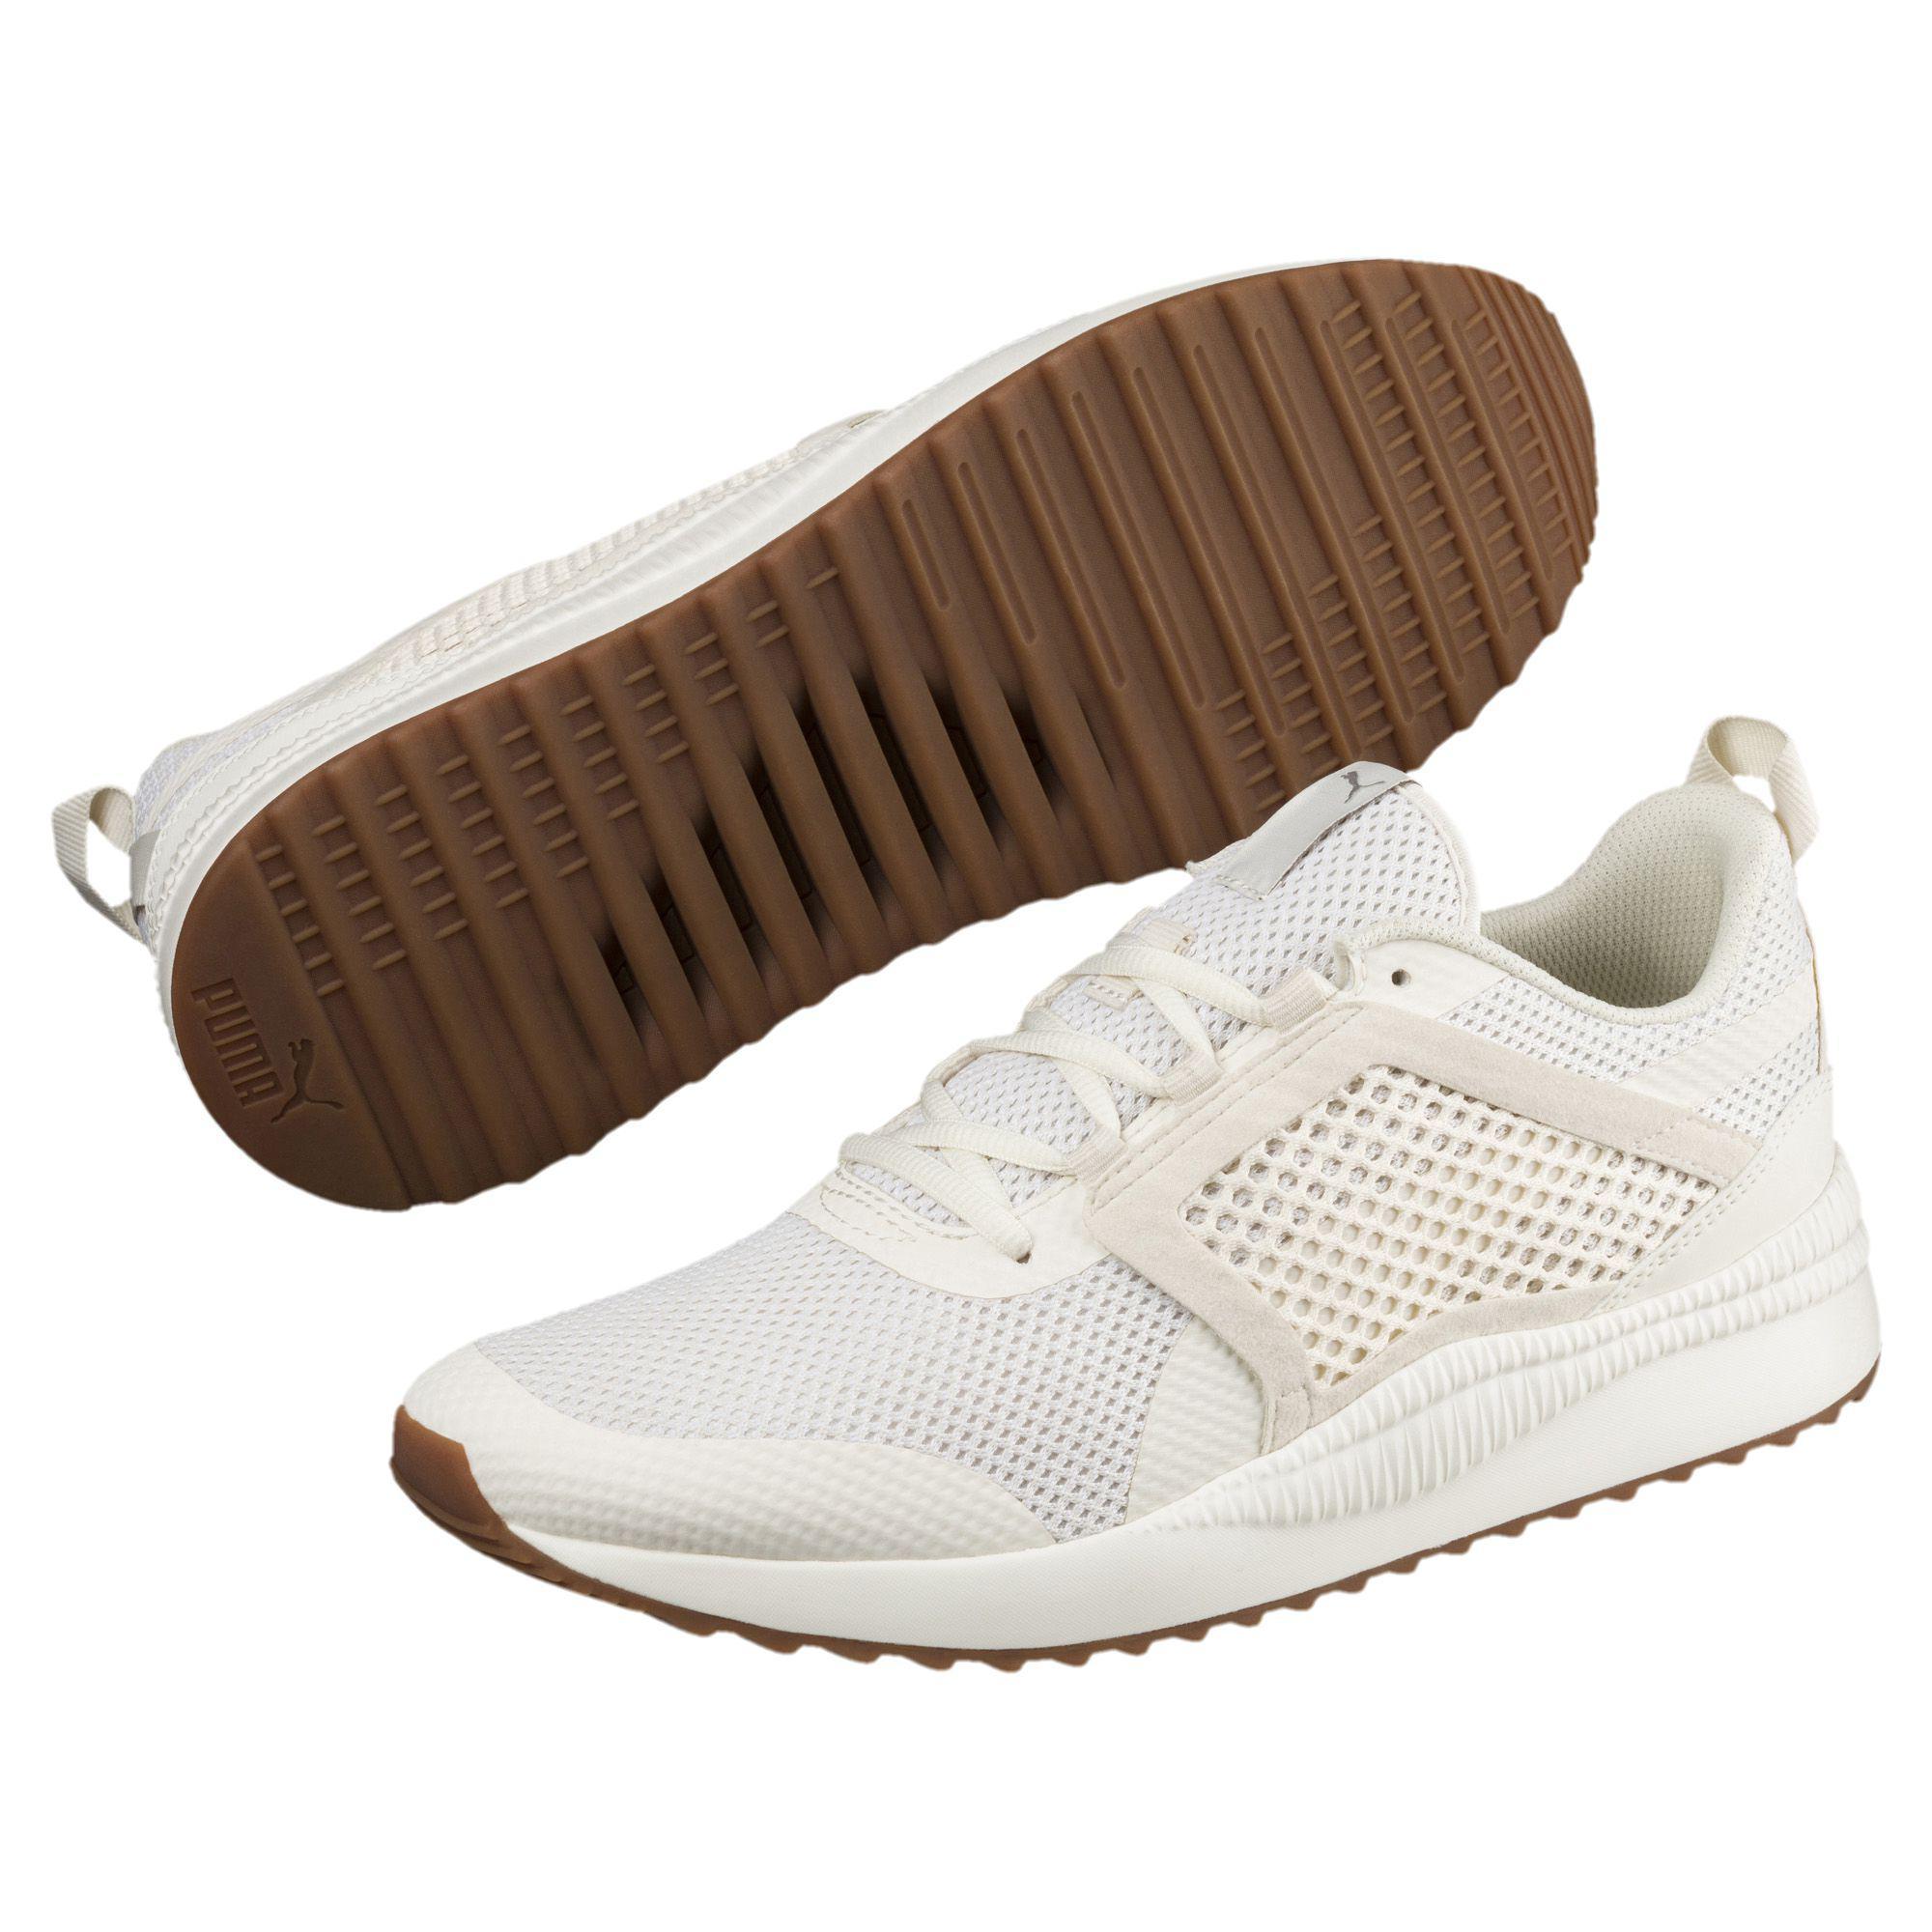 Lyst Weiß Puma Pacer Next Net Sneakers in Weiß Lyst d0e444